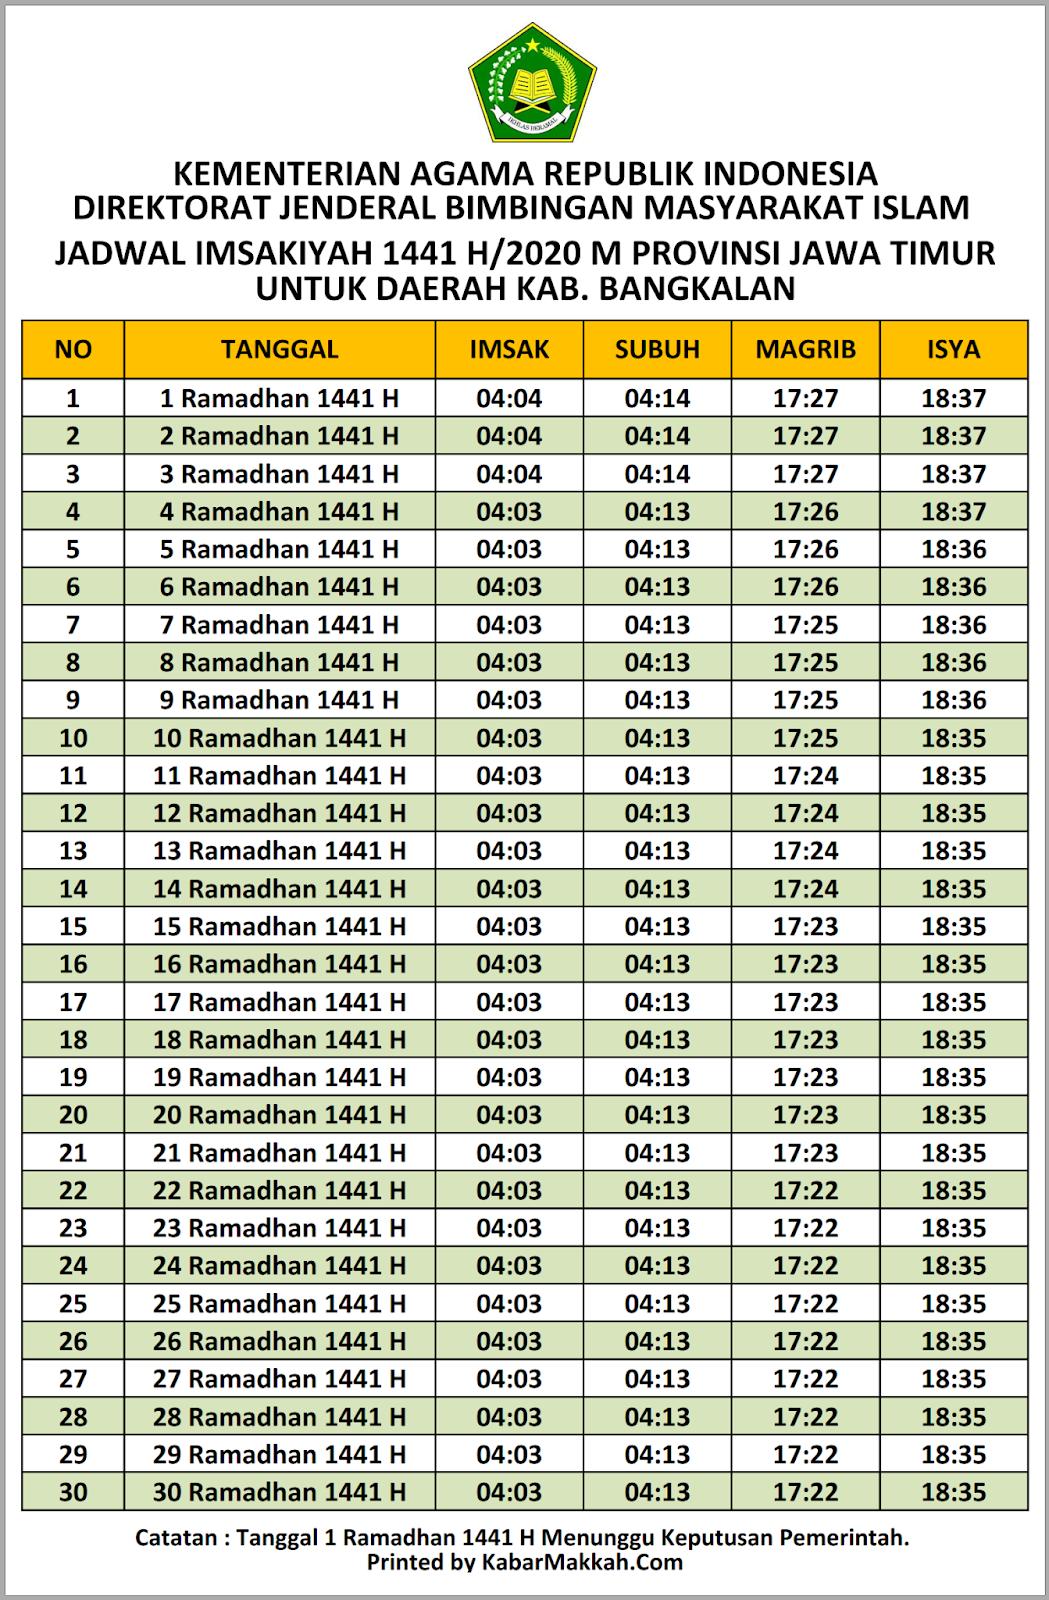 Jadwal Imsakiyah Bangkalan 2020